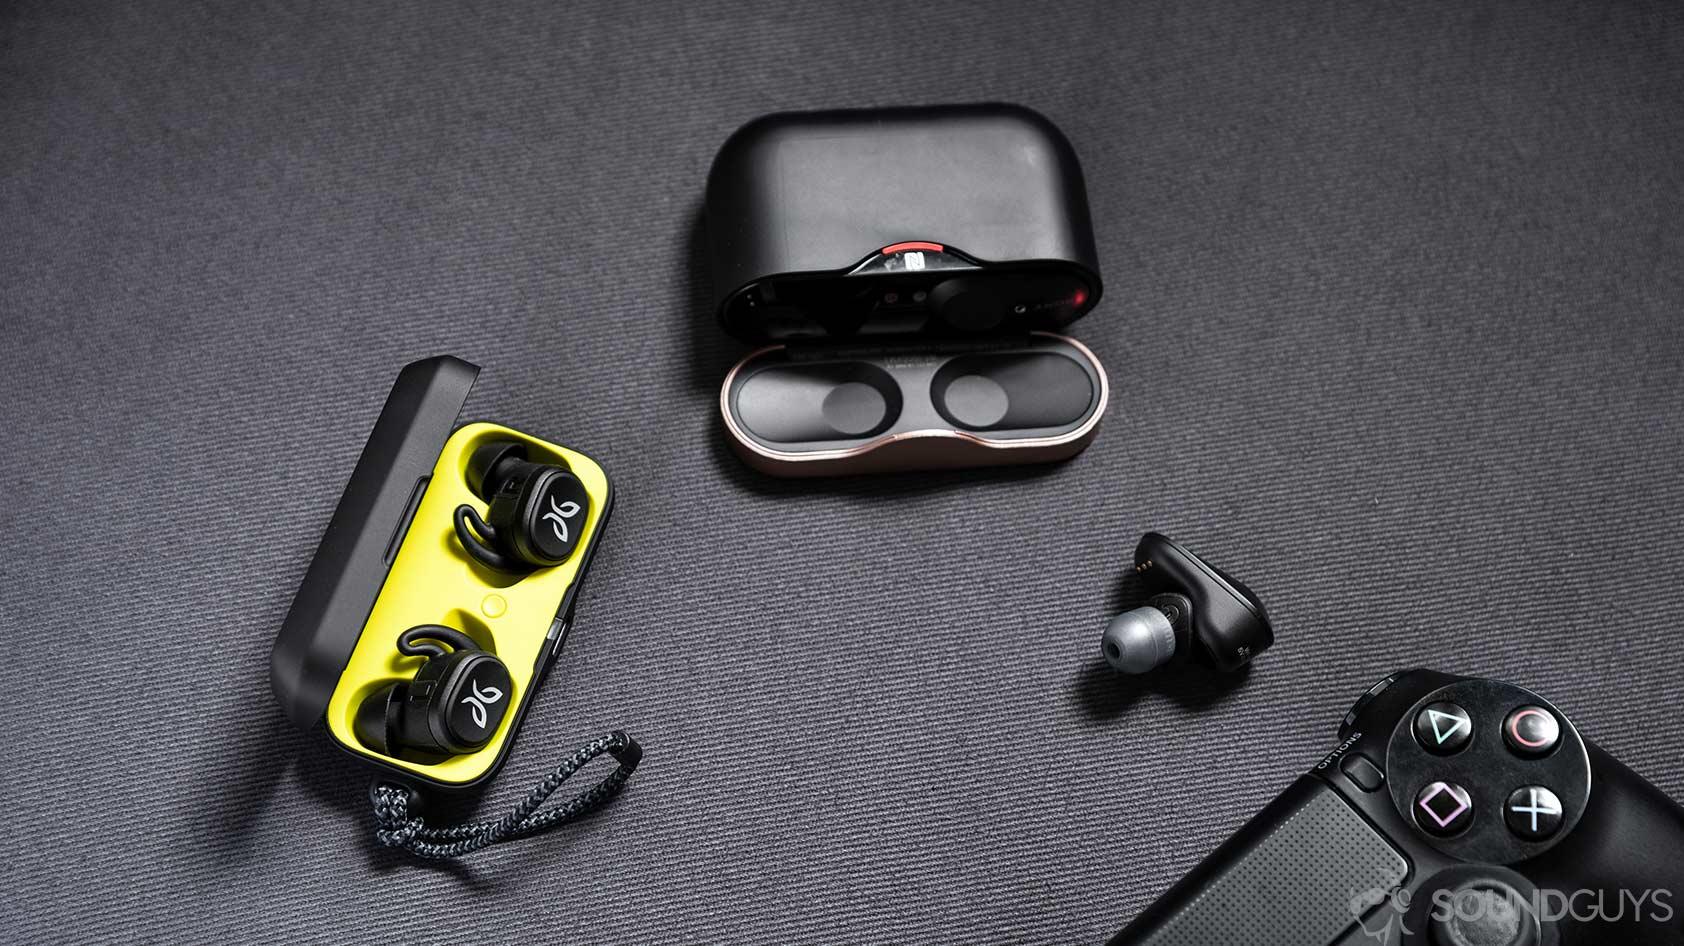 Jaybird Vista 4 earbuds charging case USB C Sony WF1000XM3 PS4 PlayStation controller